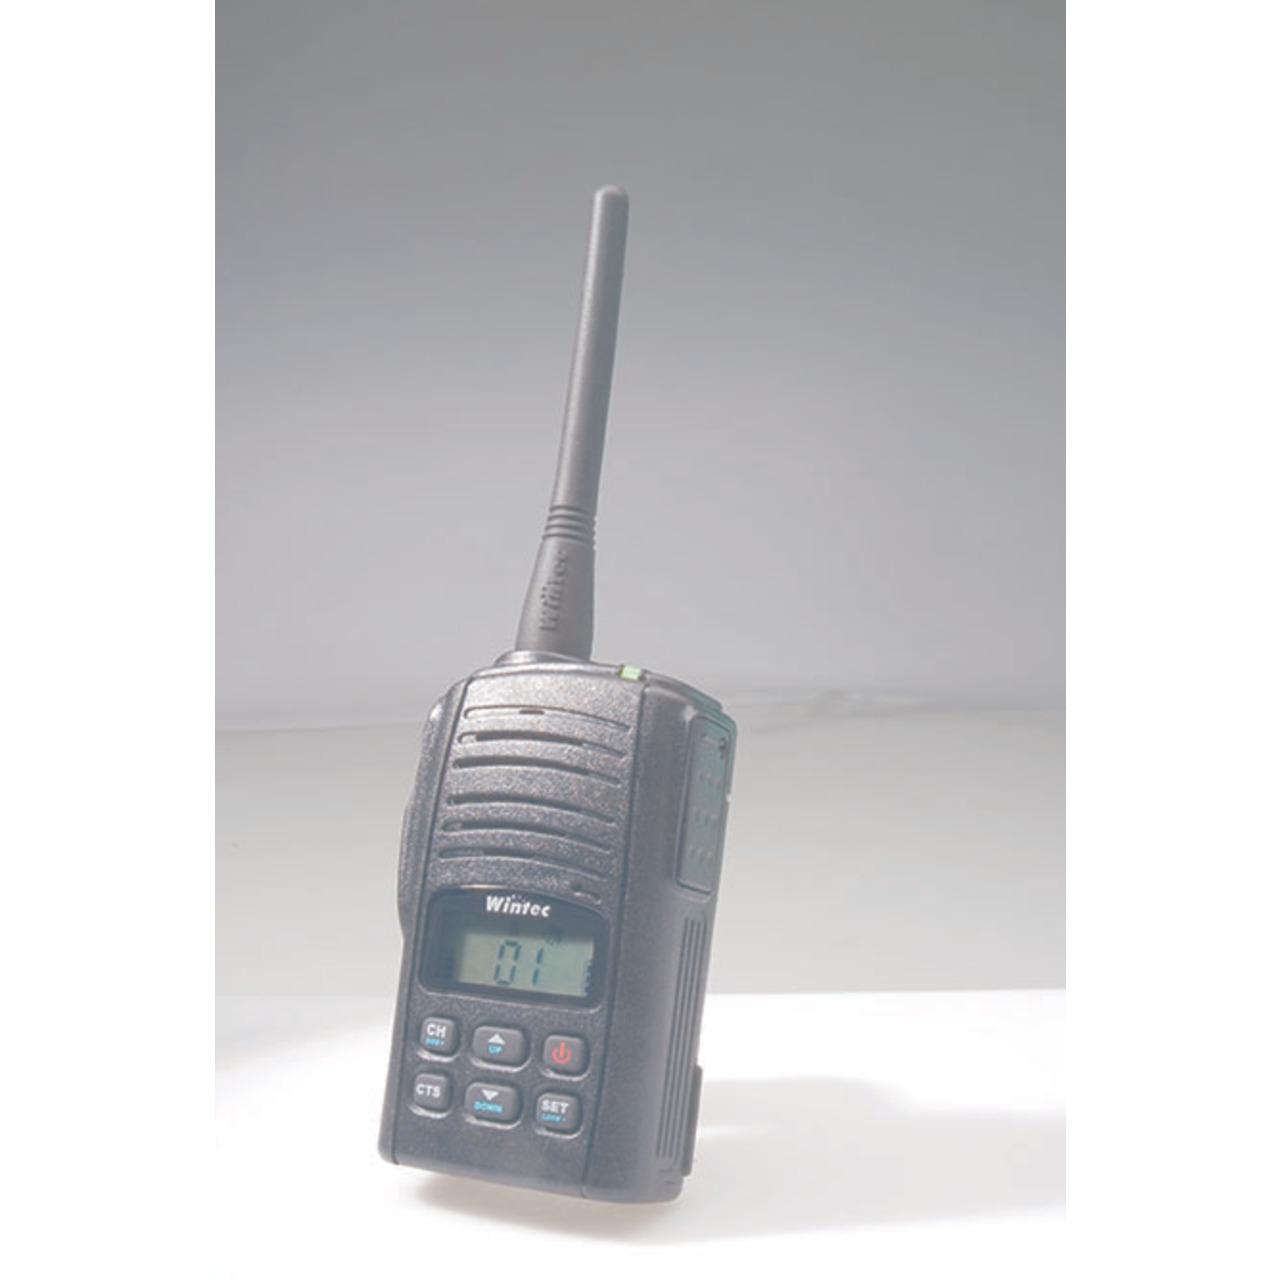 Wintec LP-4502 PMR-Funkgerät